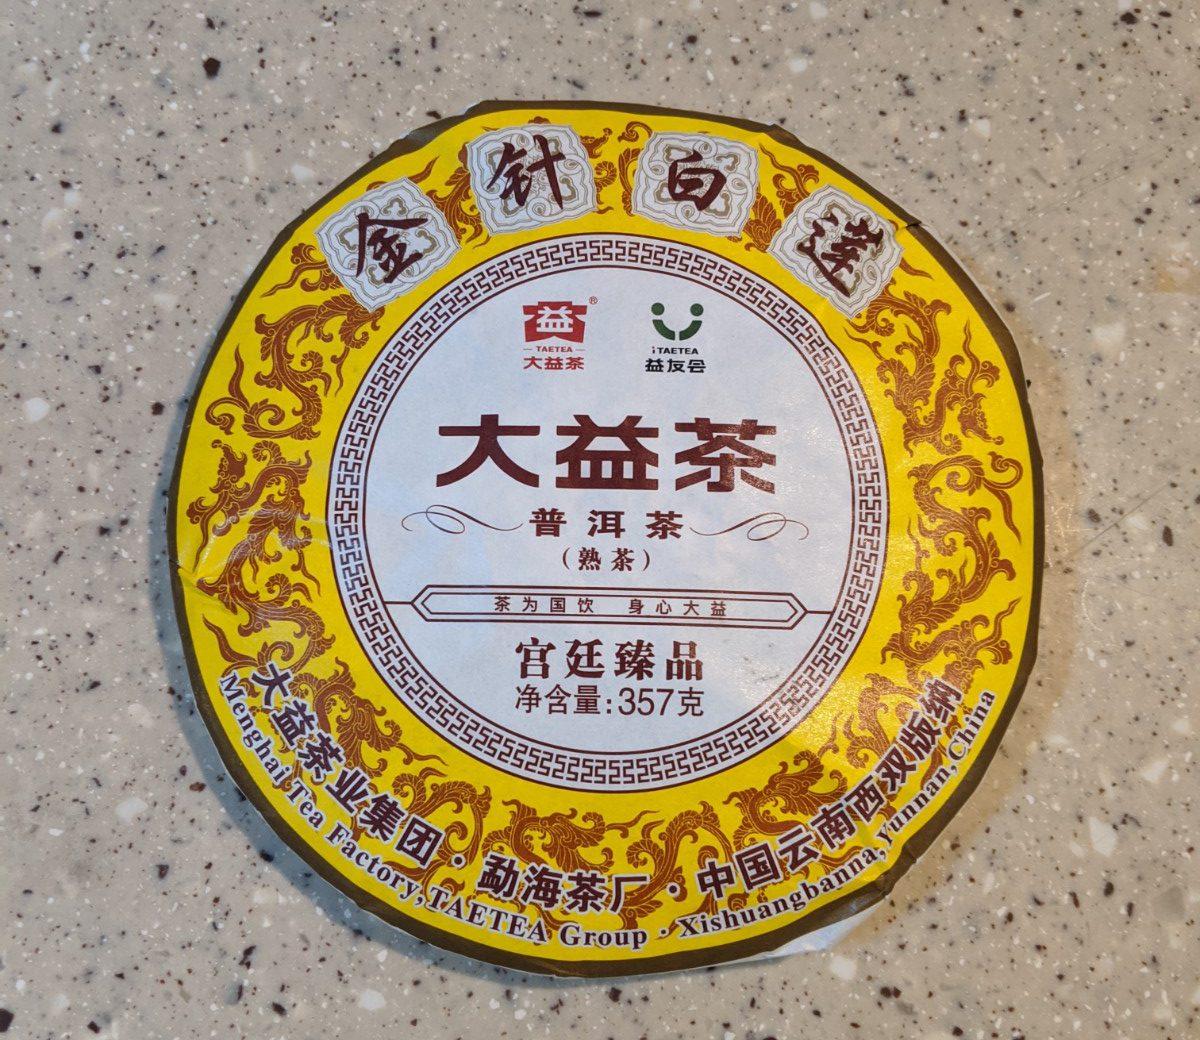 buying tea from taobao